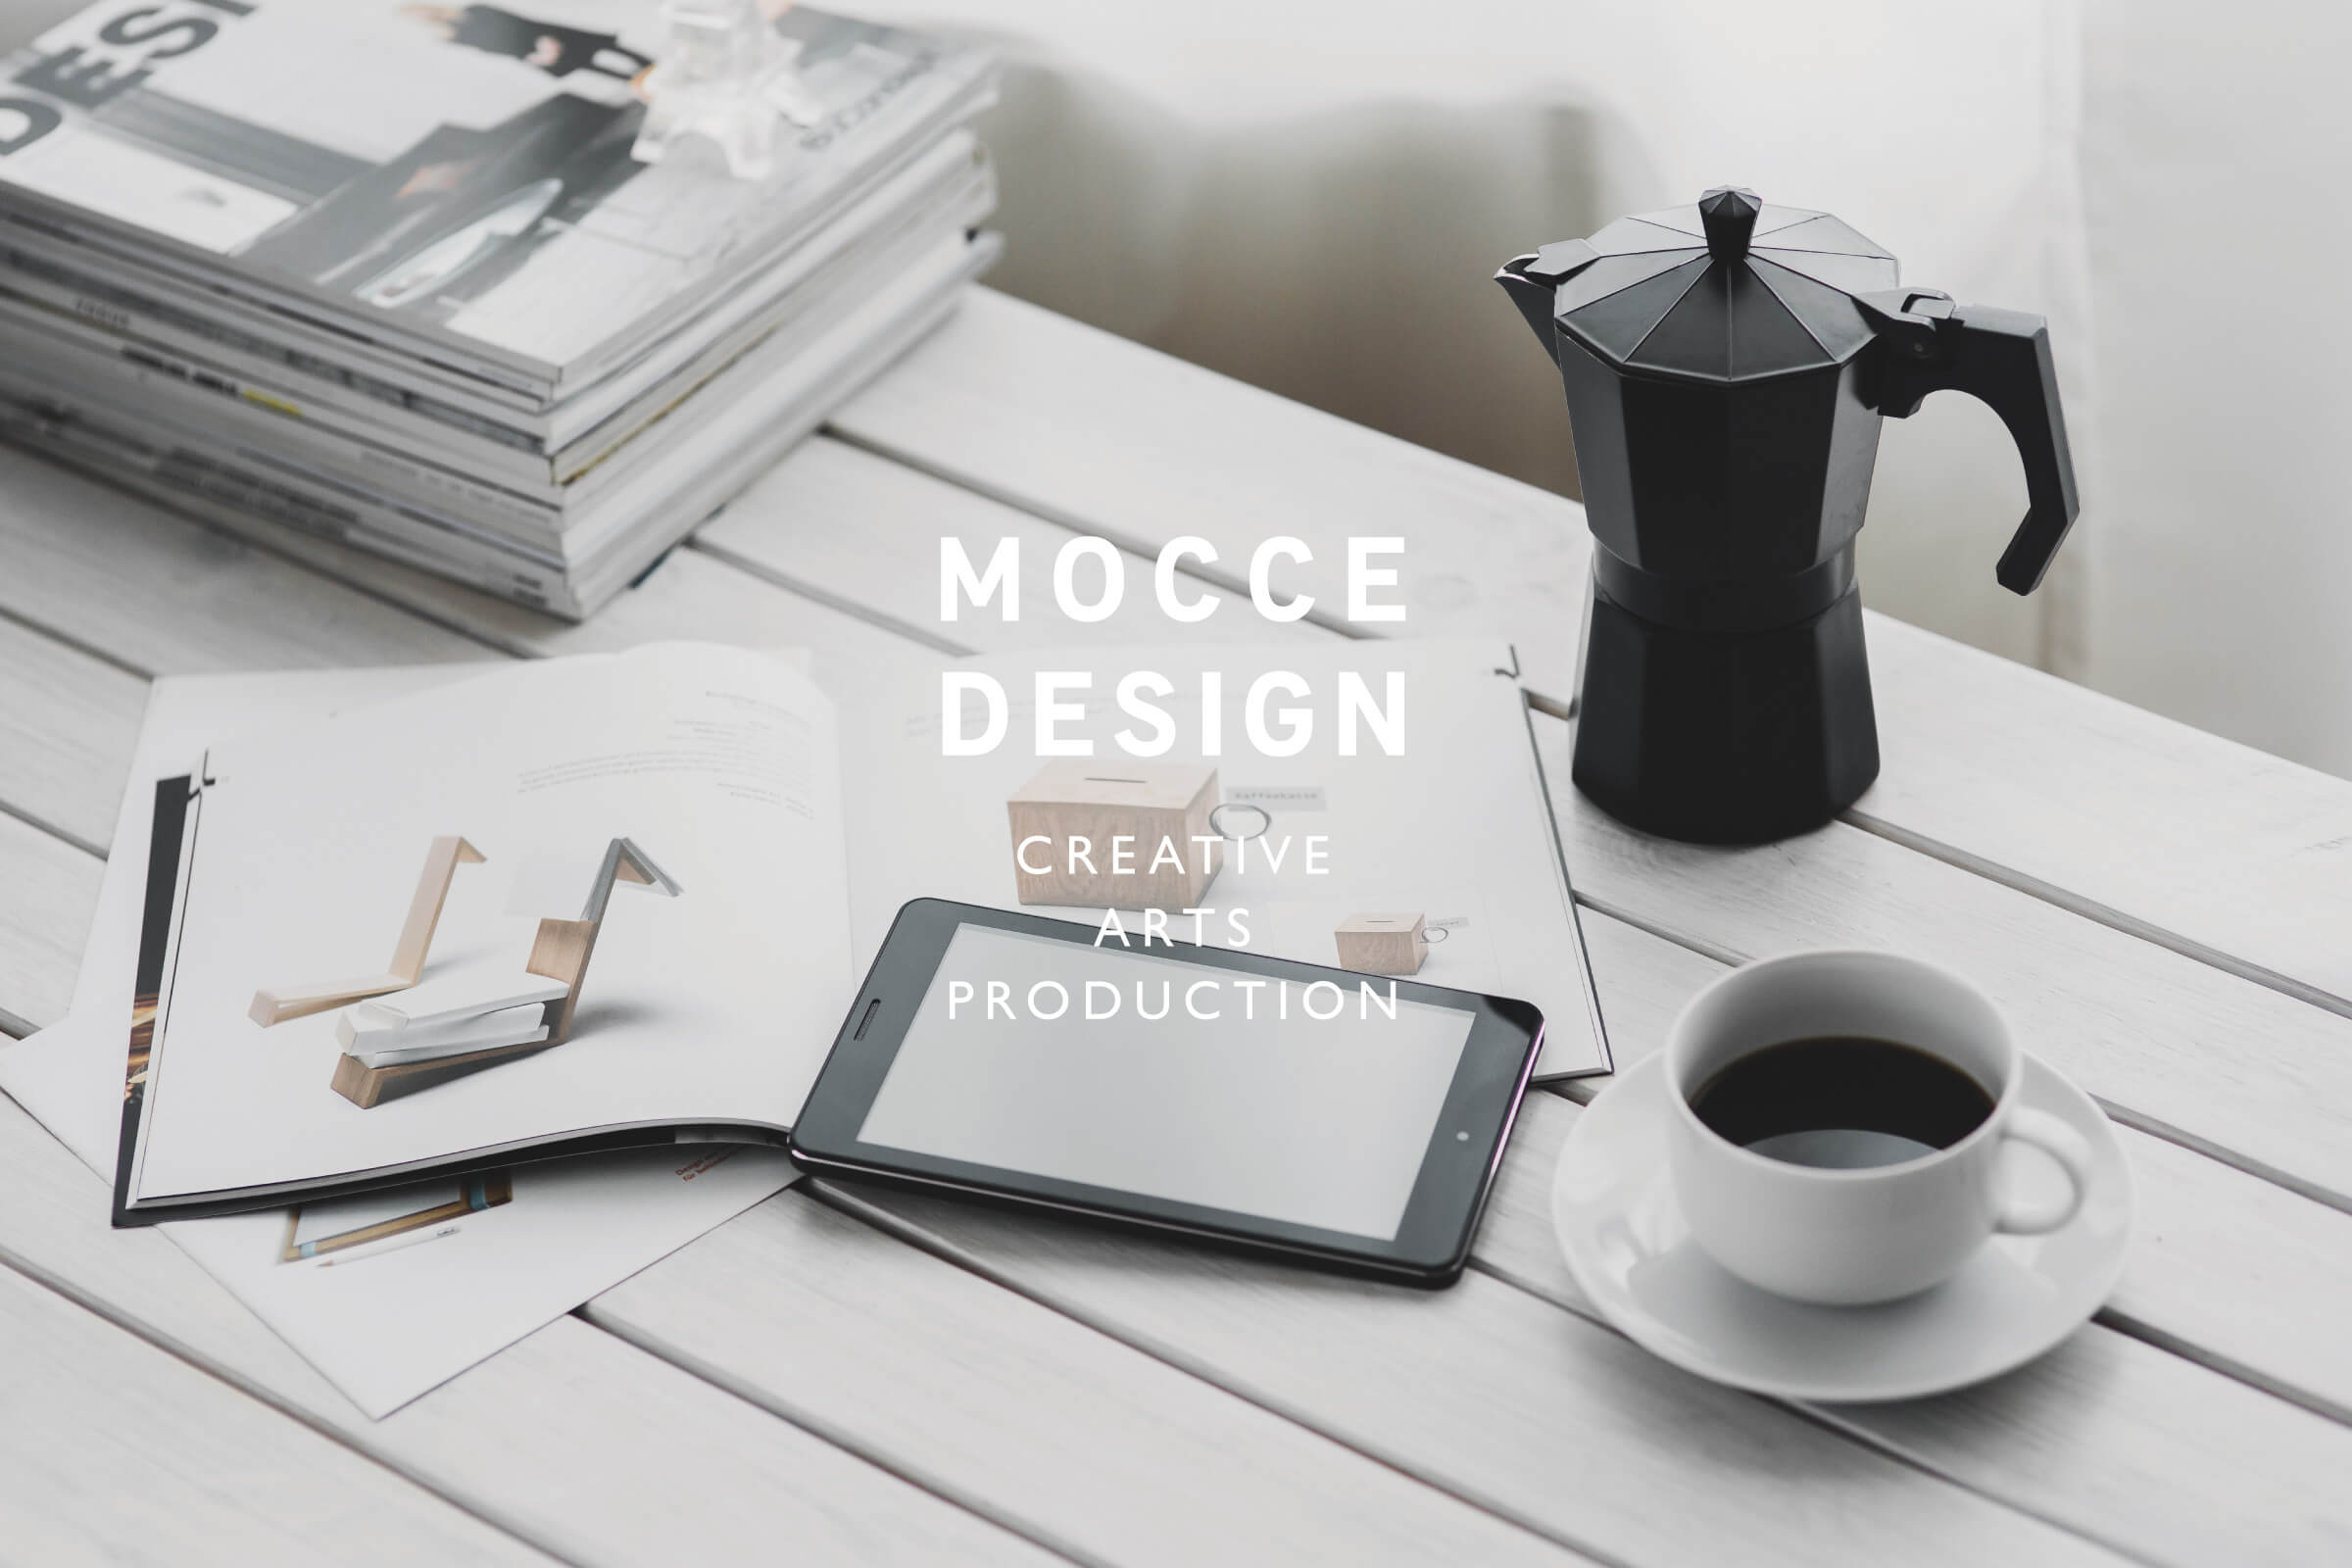 MOCCE DESIGN CREATIVE ARTS PRODUCTION